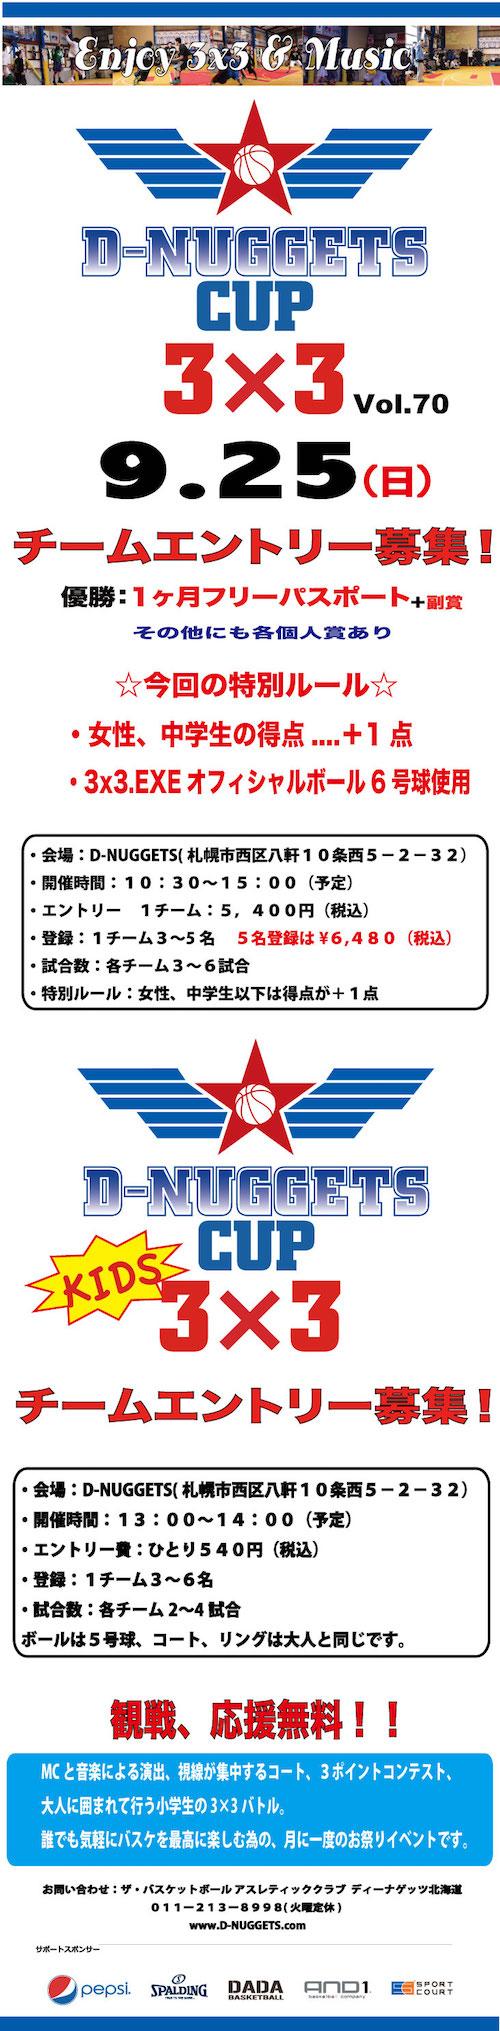 D-NUGGETS-CUP-HOKKAIDO-Vol.70.jpg